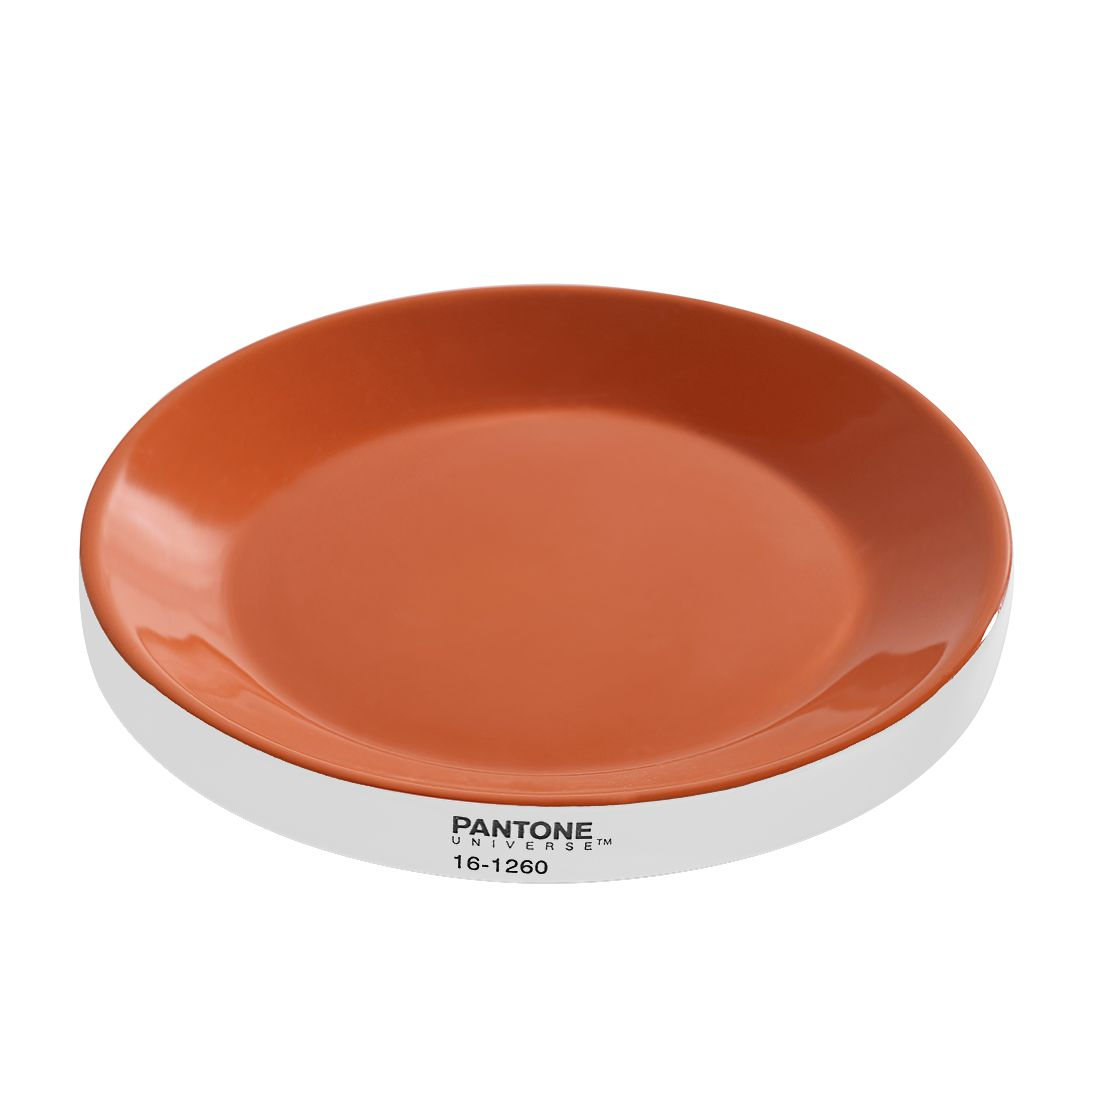 Teller Pantone I (3er-Set) – Orange, Pantone jetzt bestellen